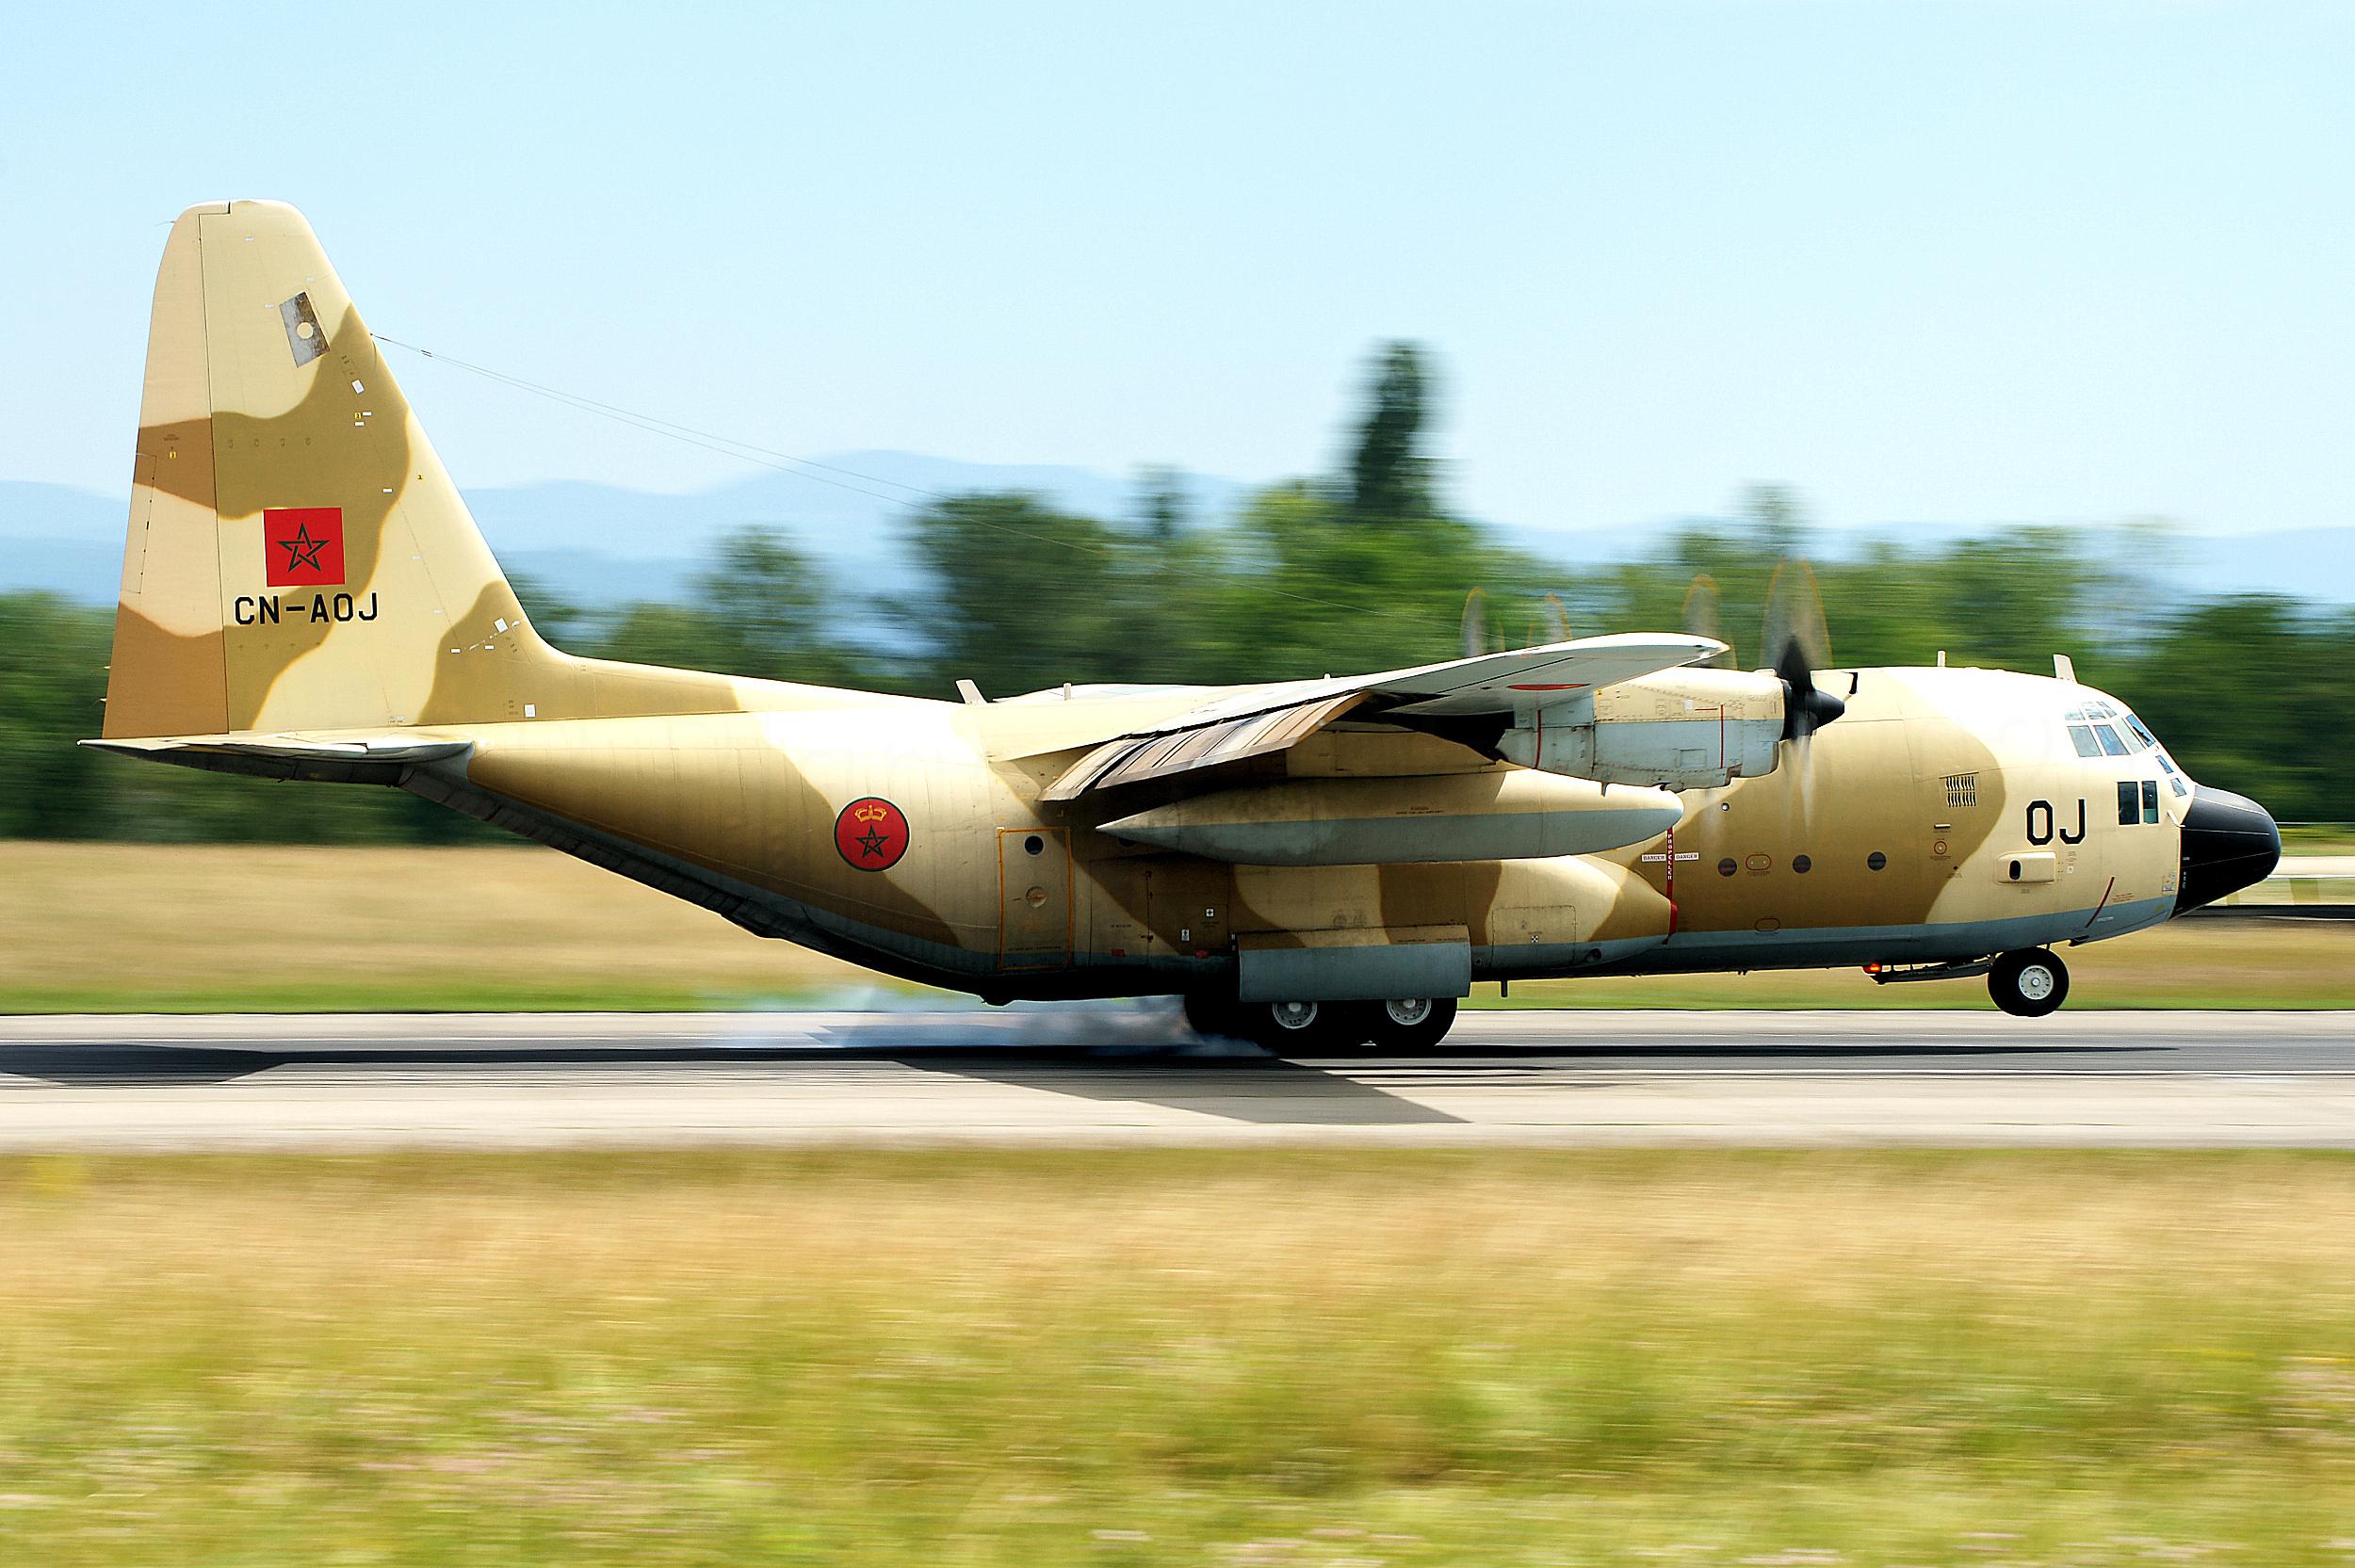 FRA: Photos d'avions de transport - Page 40 49999225002_cdd5af8c9e_o_d